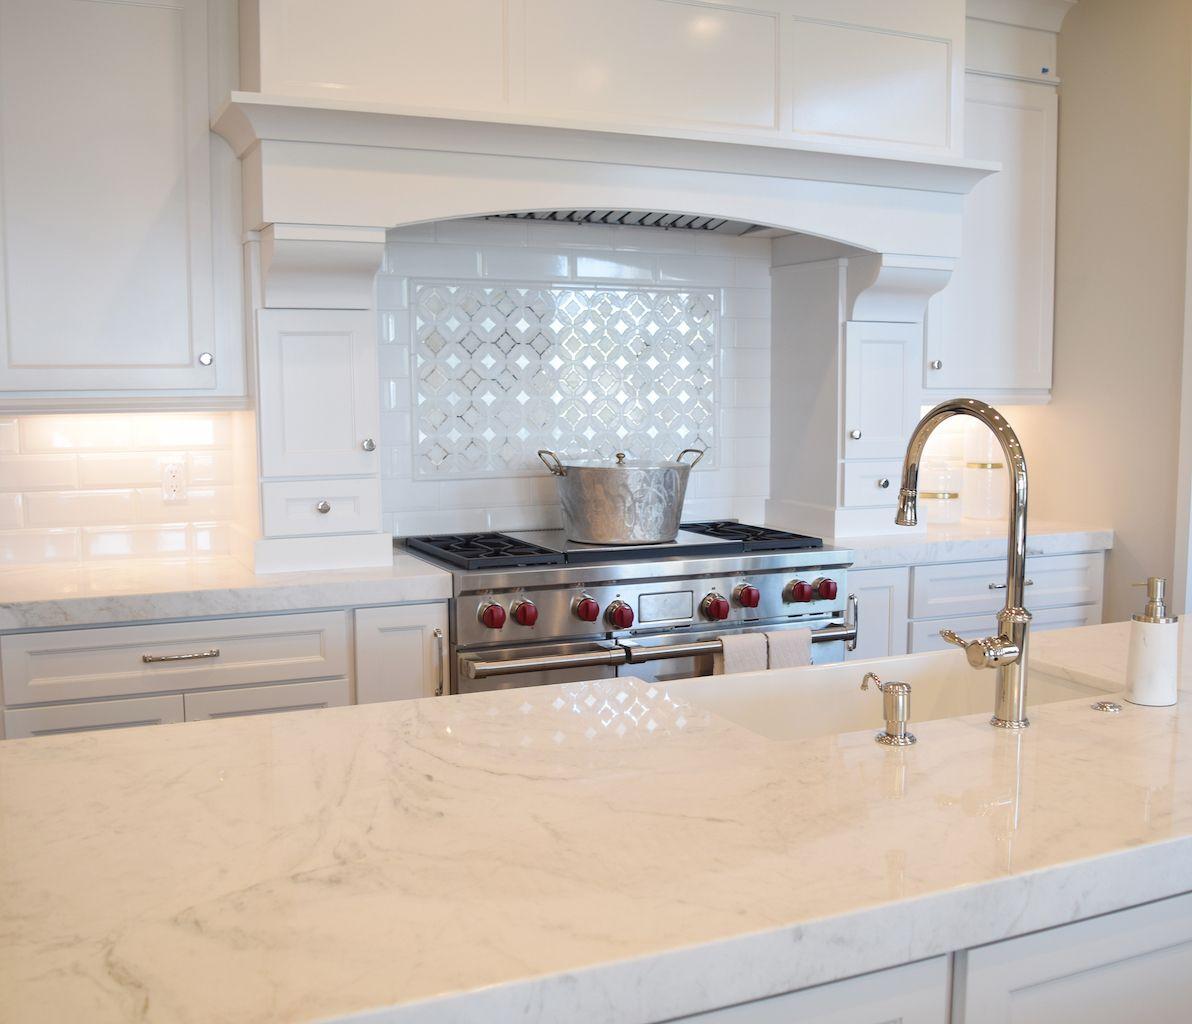 Kitchen Remodel Quartz Countertop: Kitchen Countertops